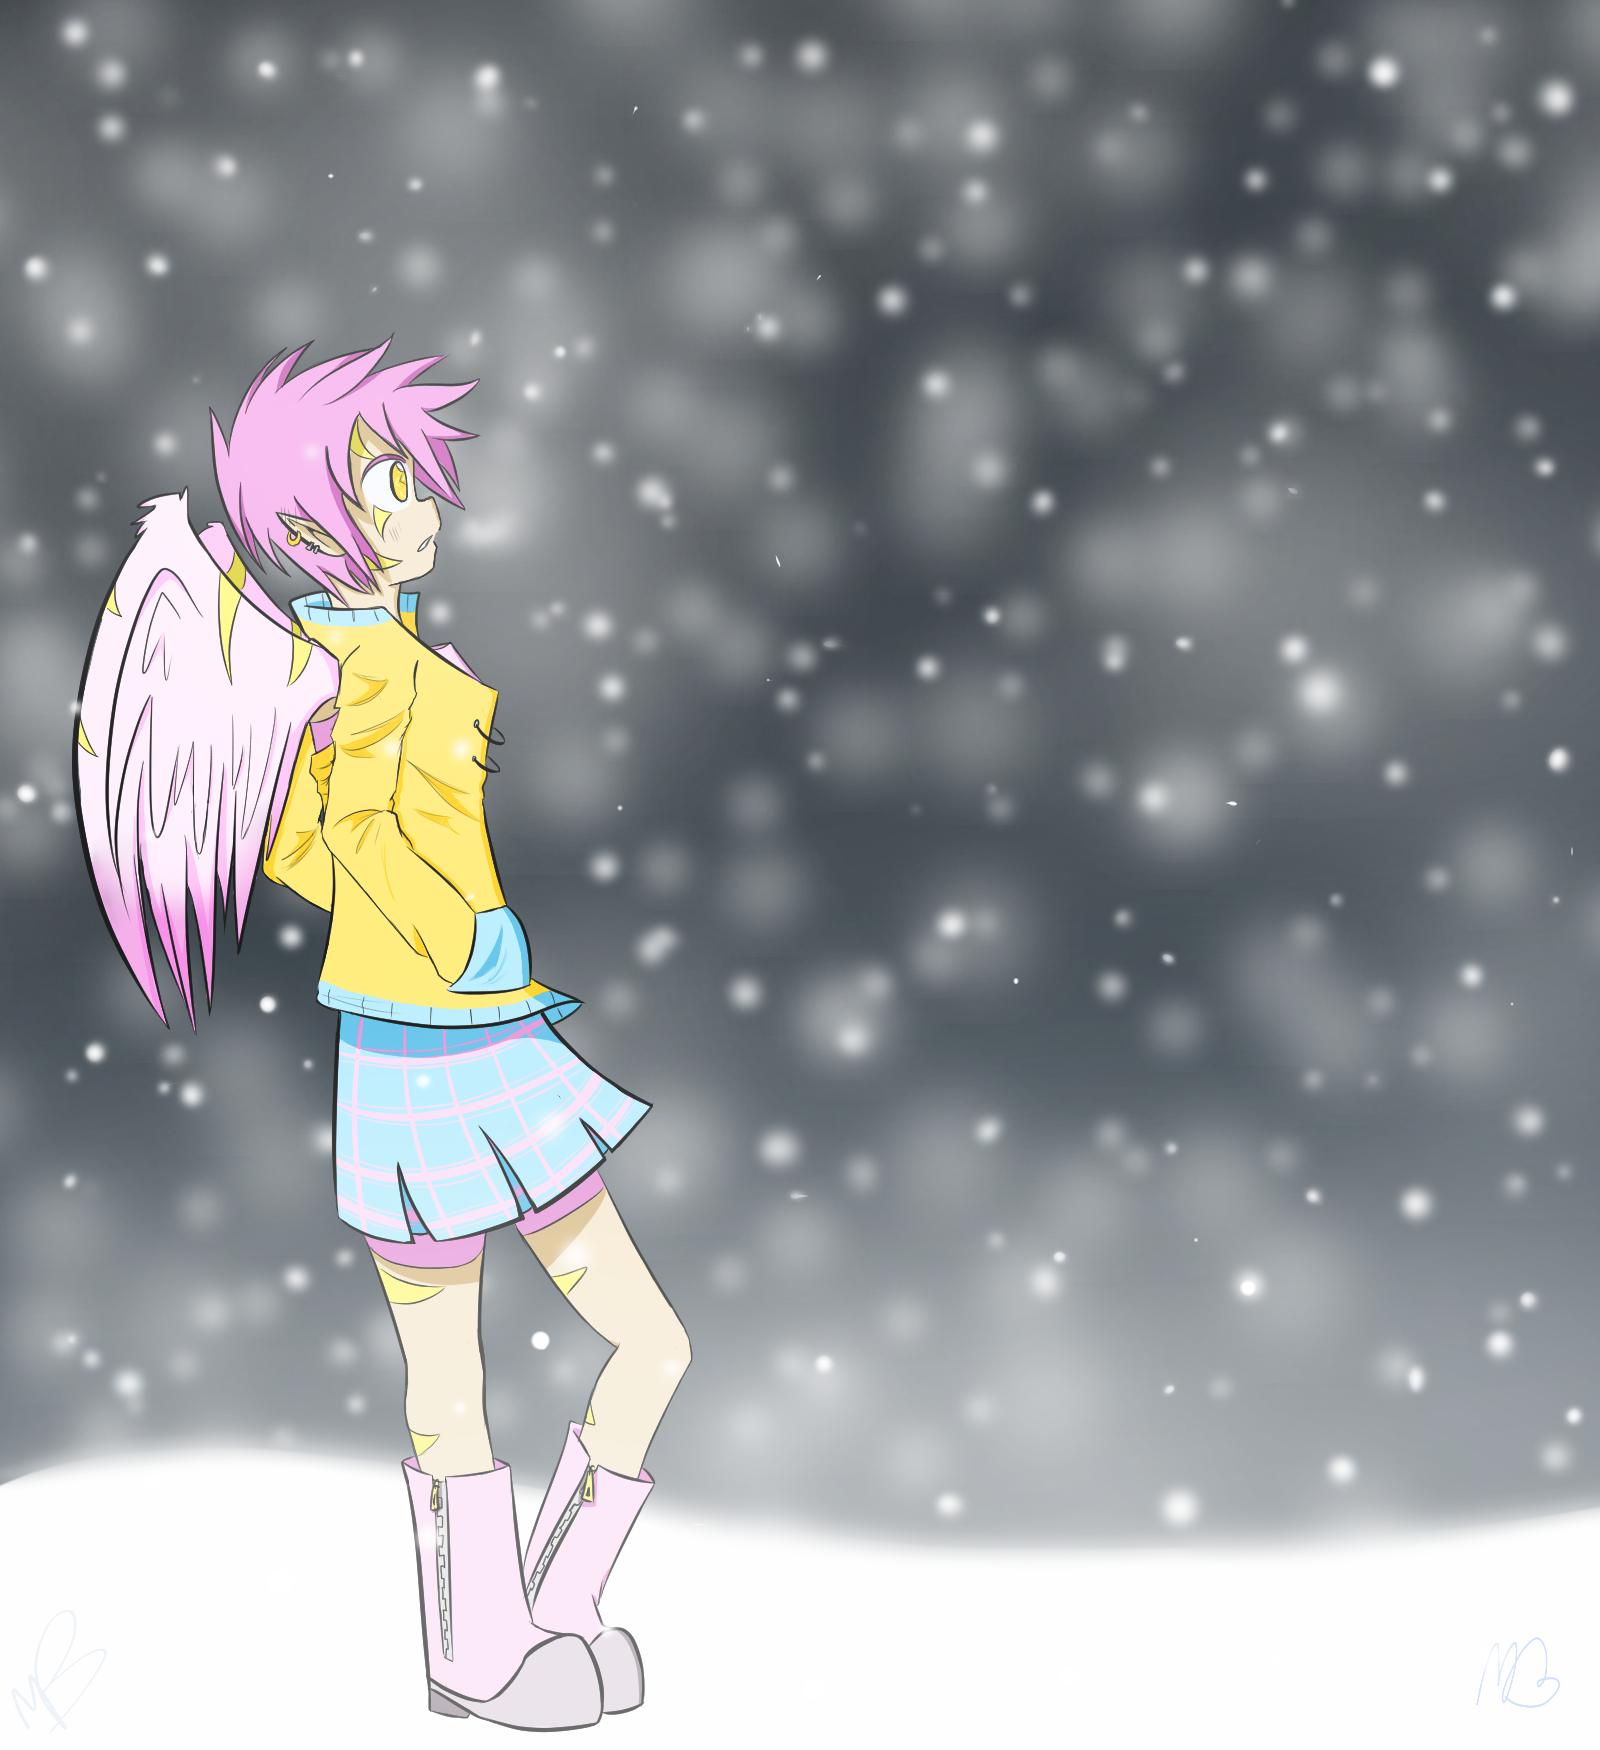 cold by MidnightBlaze16